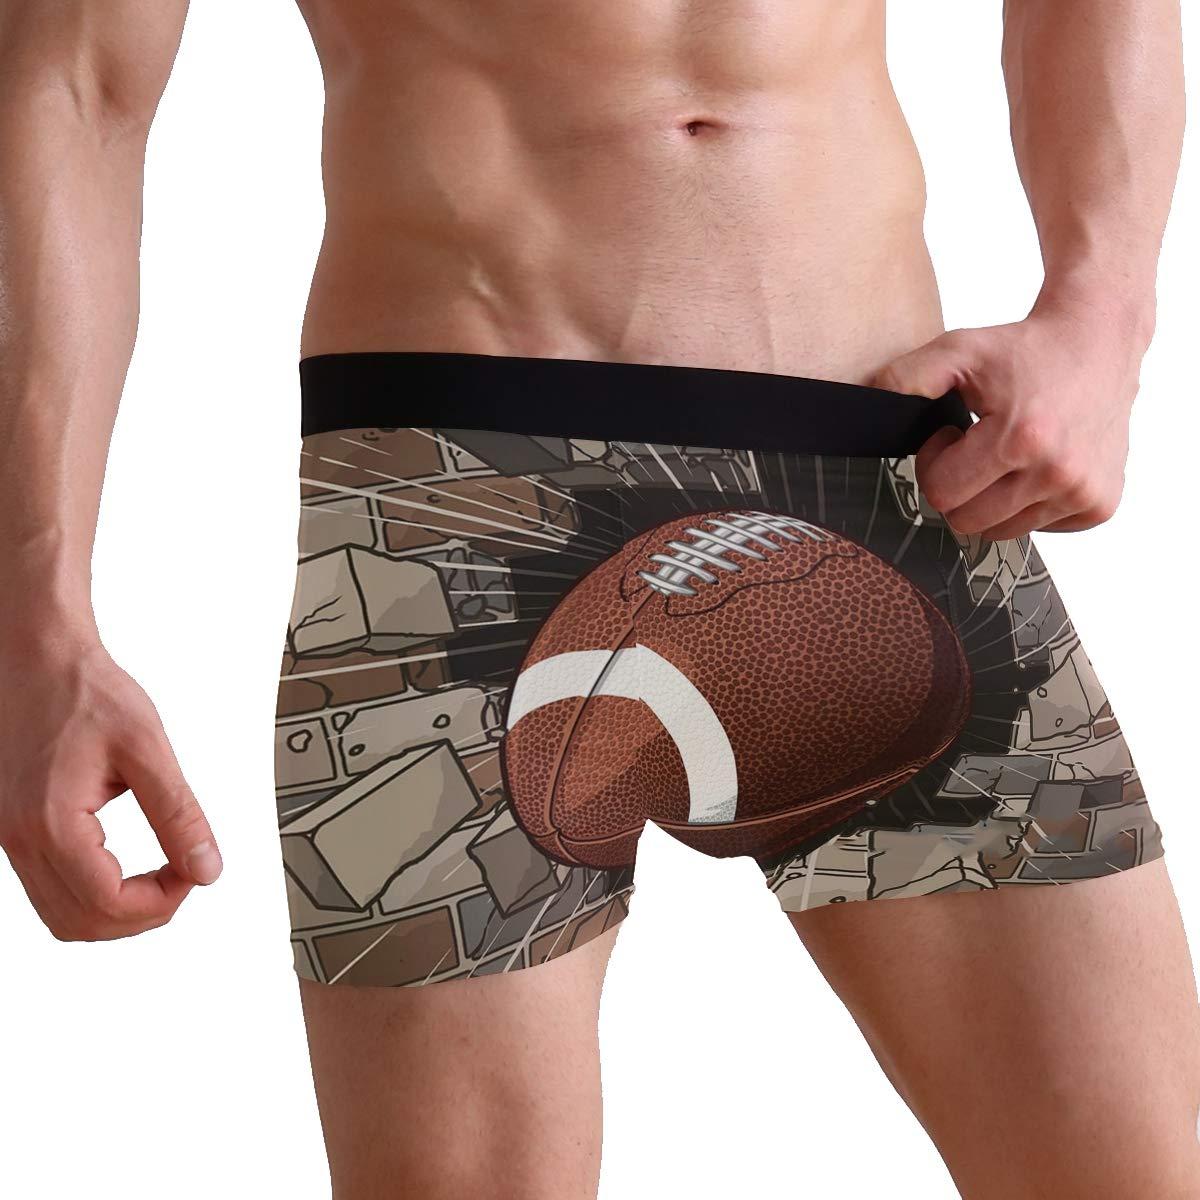 Mens Football Breaking Through Brick Wall Stretch 2 Pack Boxer Briefs Underwear